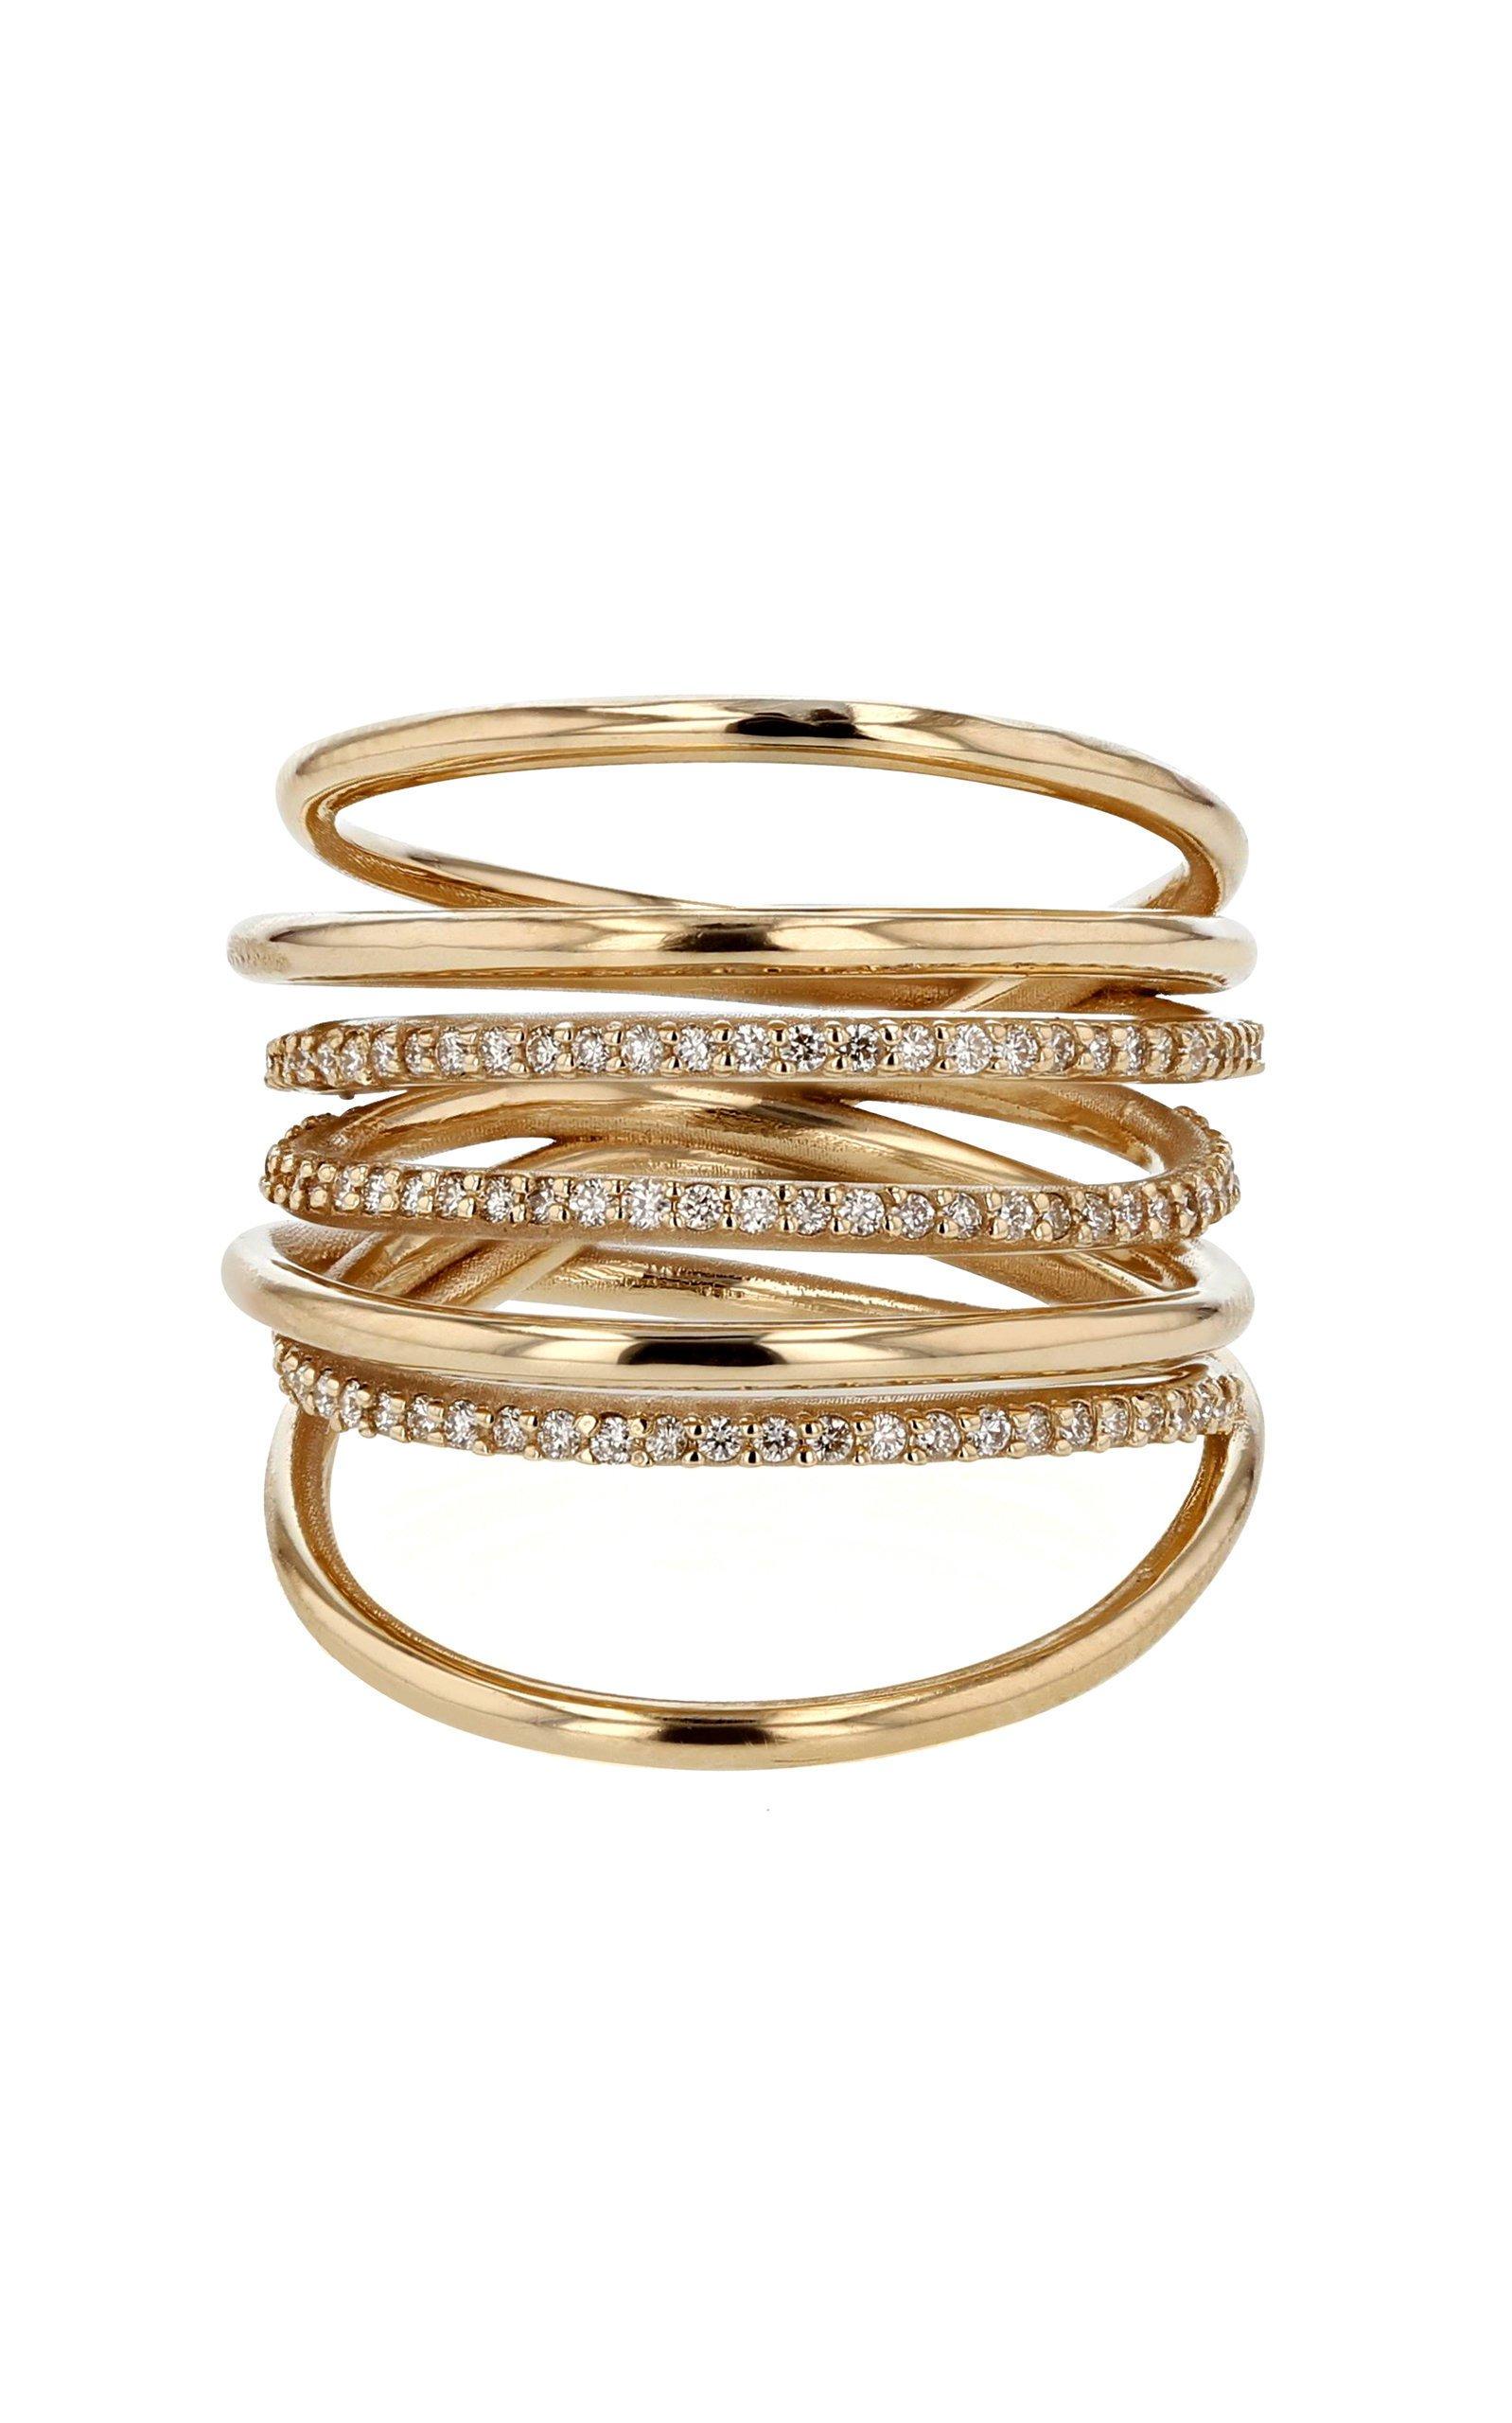 Sarah & Sebastian Entangled Ring with Diamonds